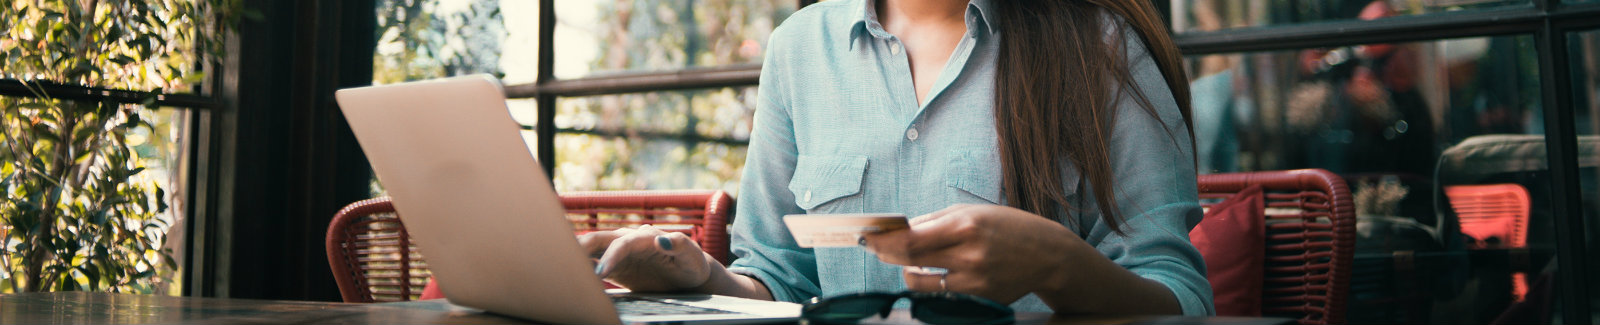 Visa Municipal Credit Cards